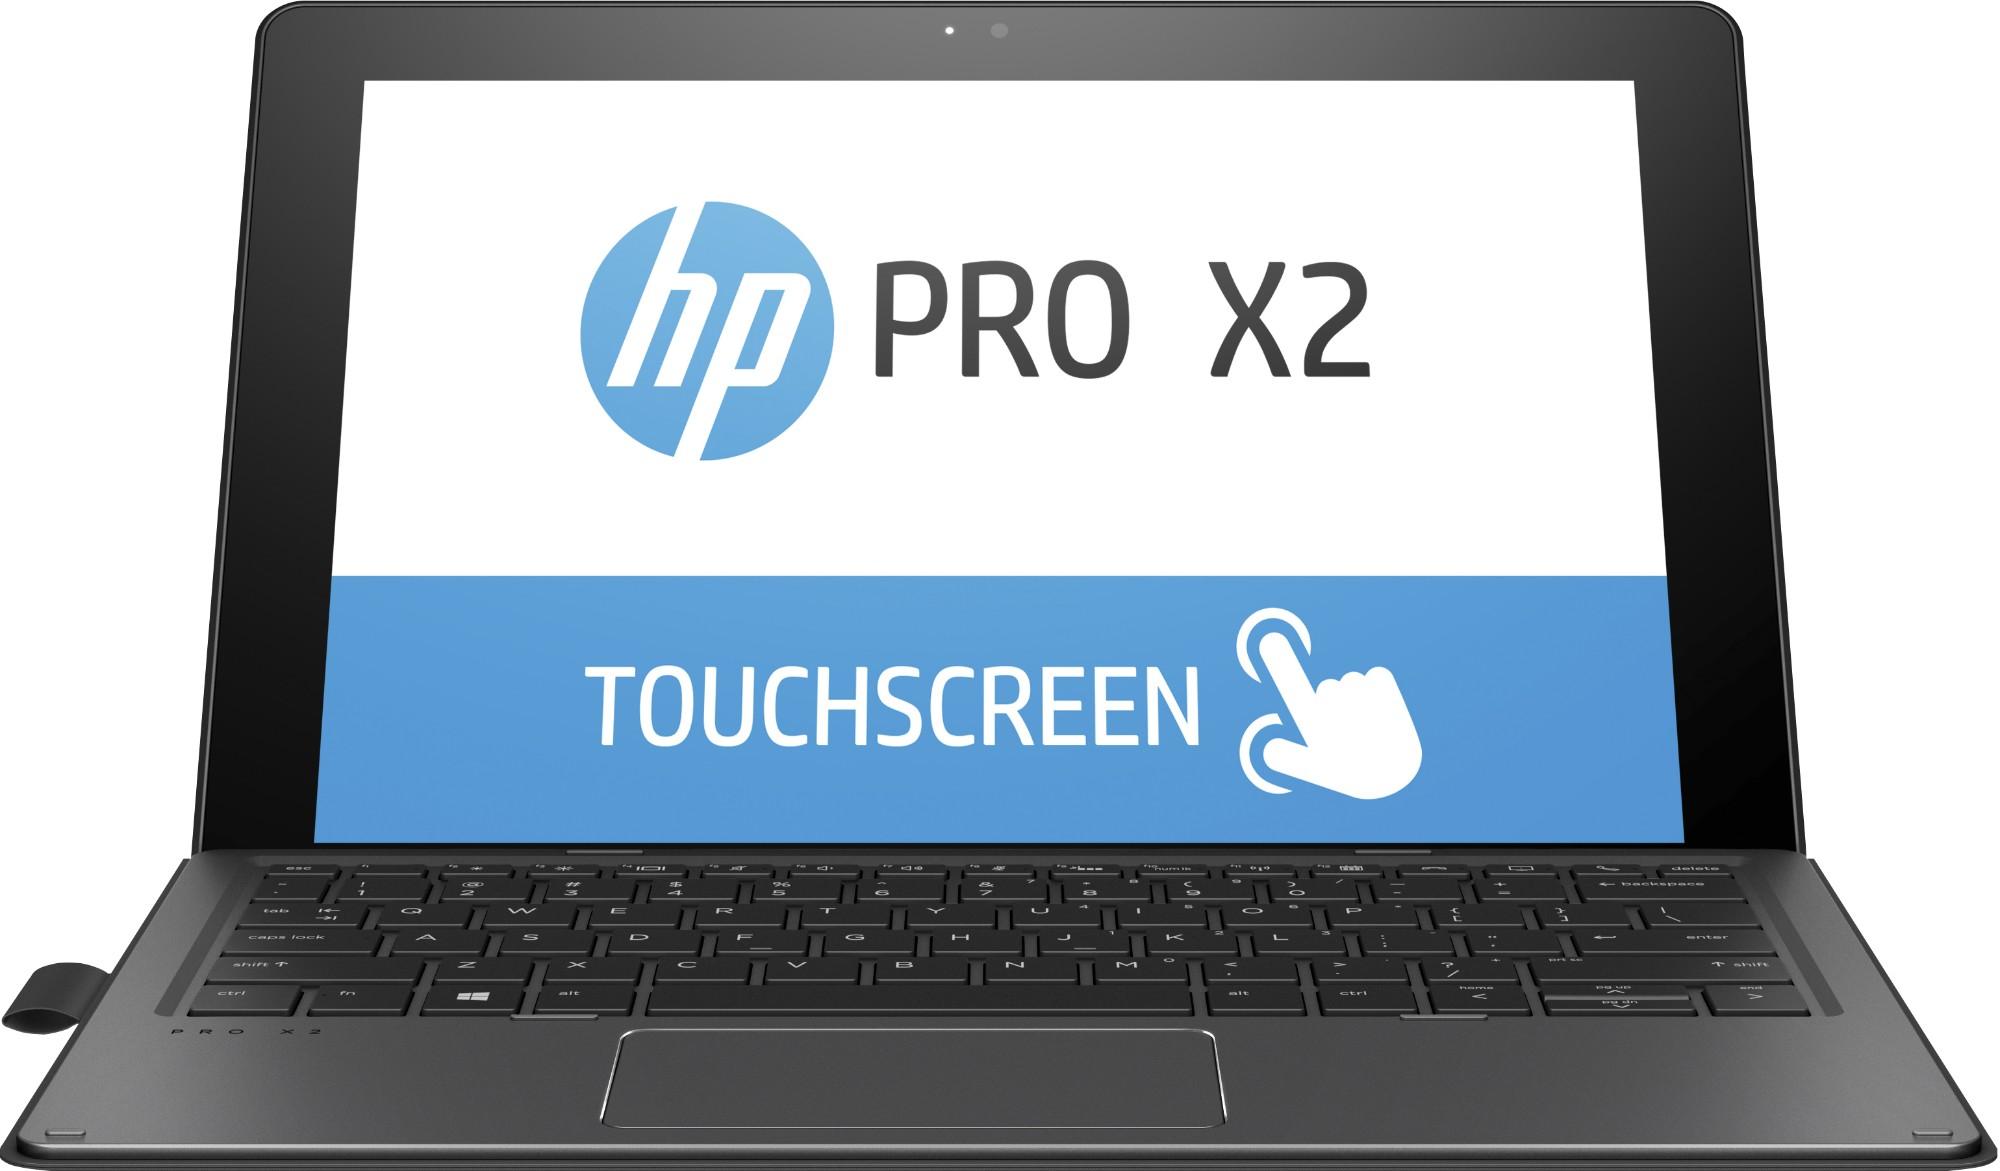 "HP Pro x2 612 G2 Zilver Hybride (2-in-1) 30,5 cm (12"") 1920 x 1280 Pixels Touchscreen 1,20 GHz Zevende generatie Intel® Core™ i5 i5-7Y54"